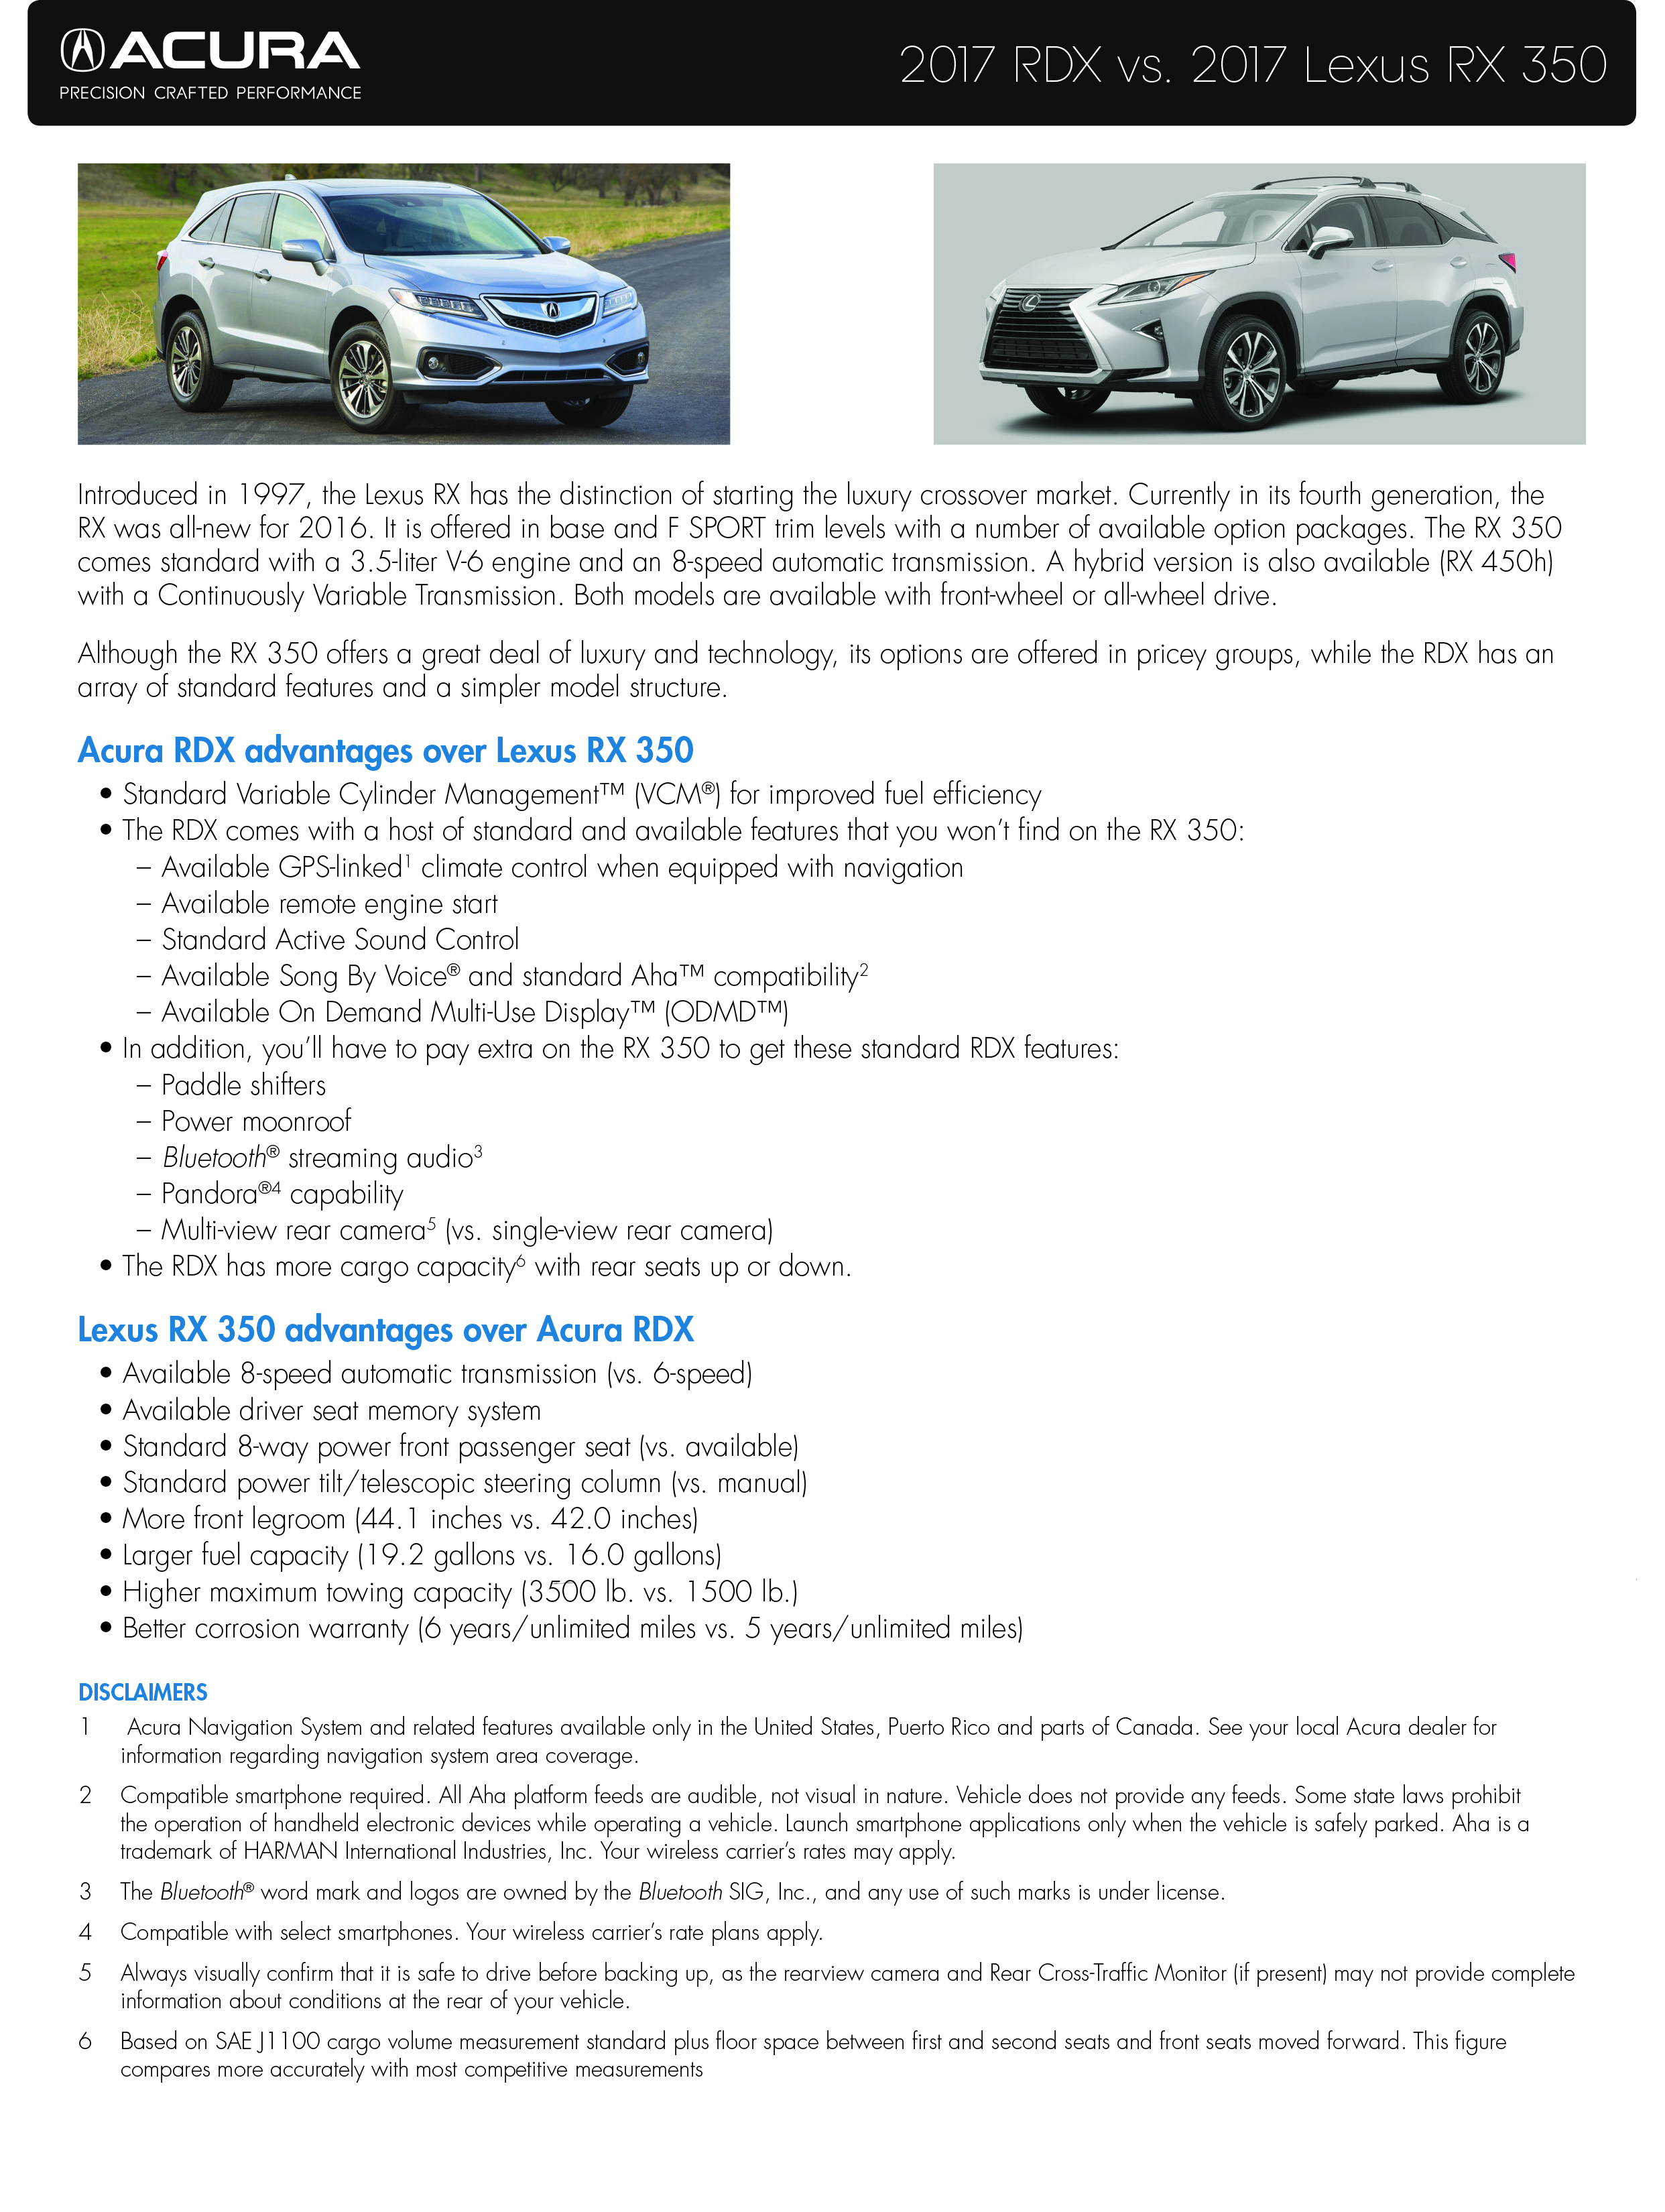 Acura RDX vs Lexus RX 350 Springfield Acura